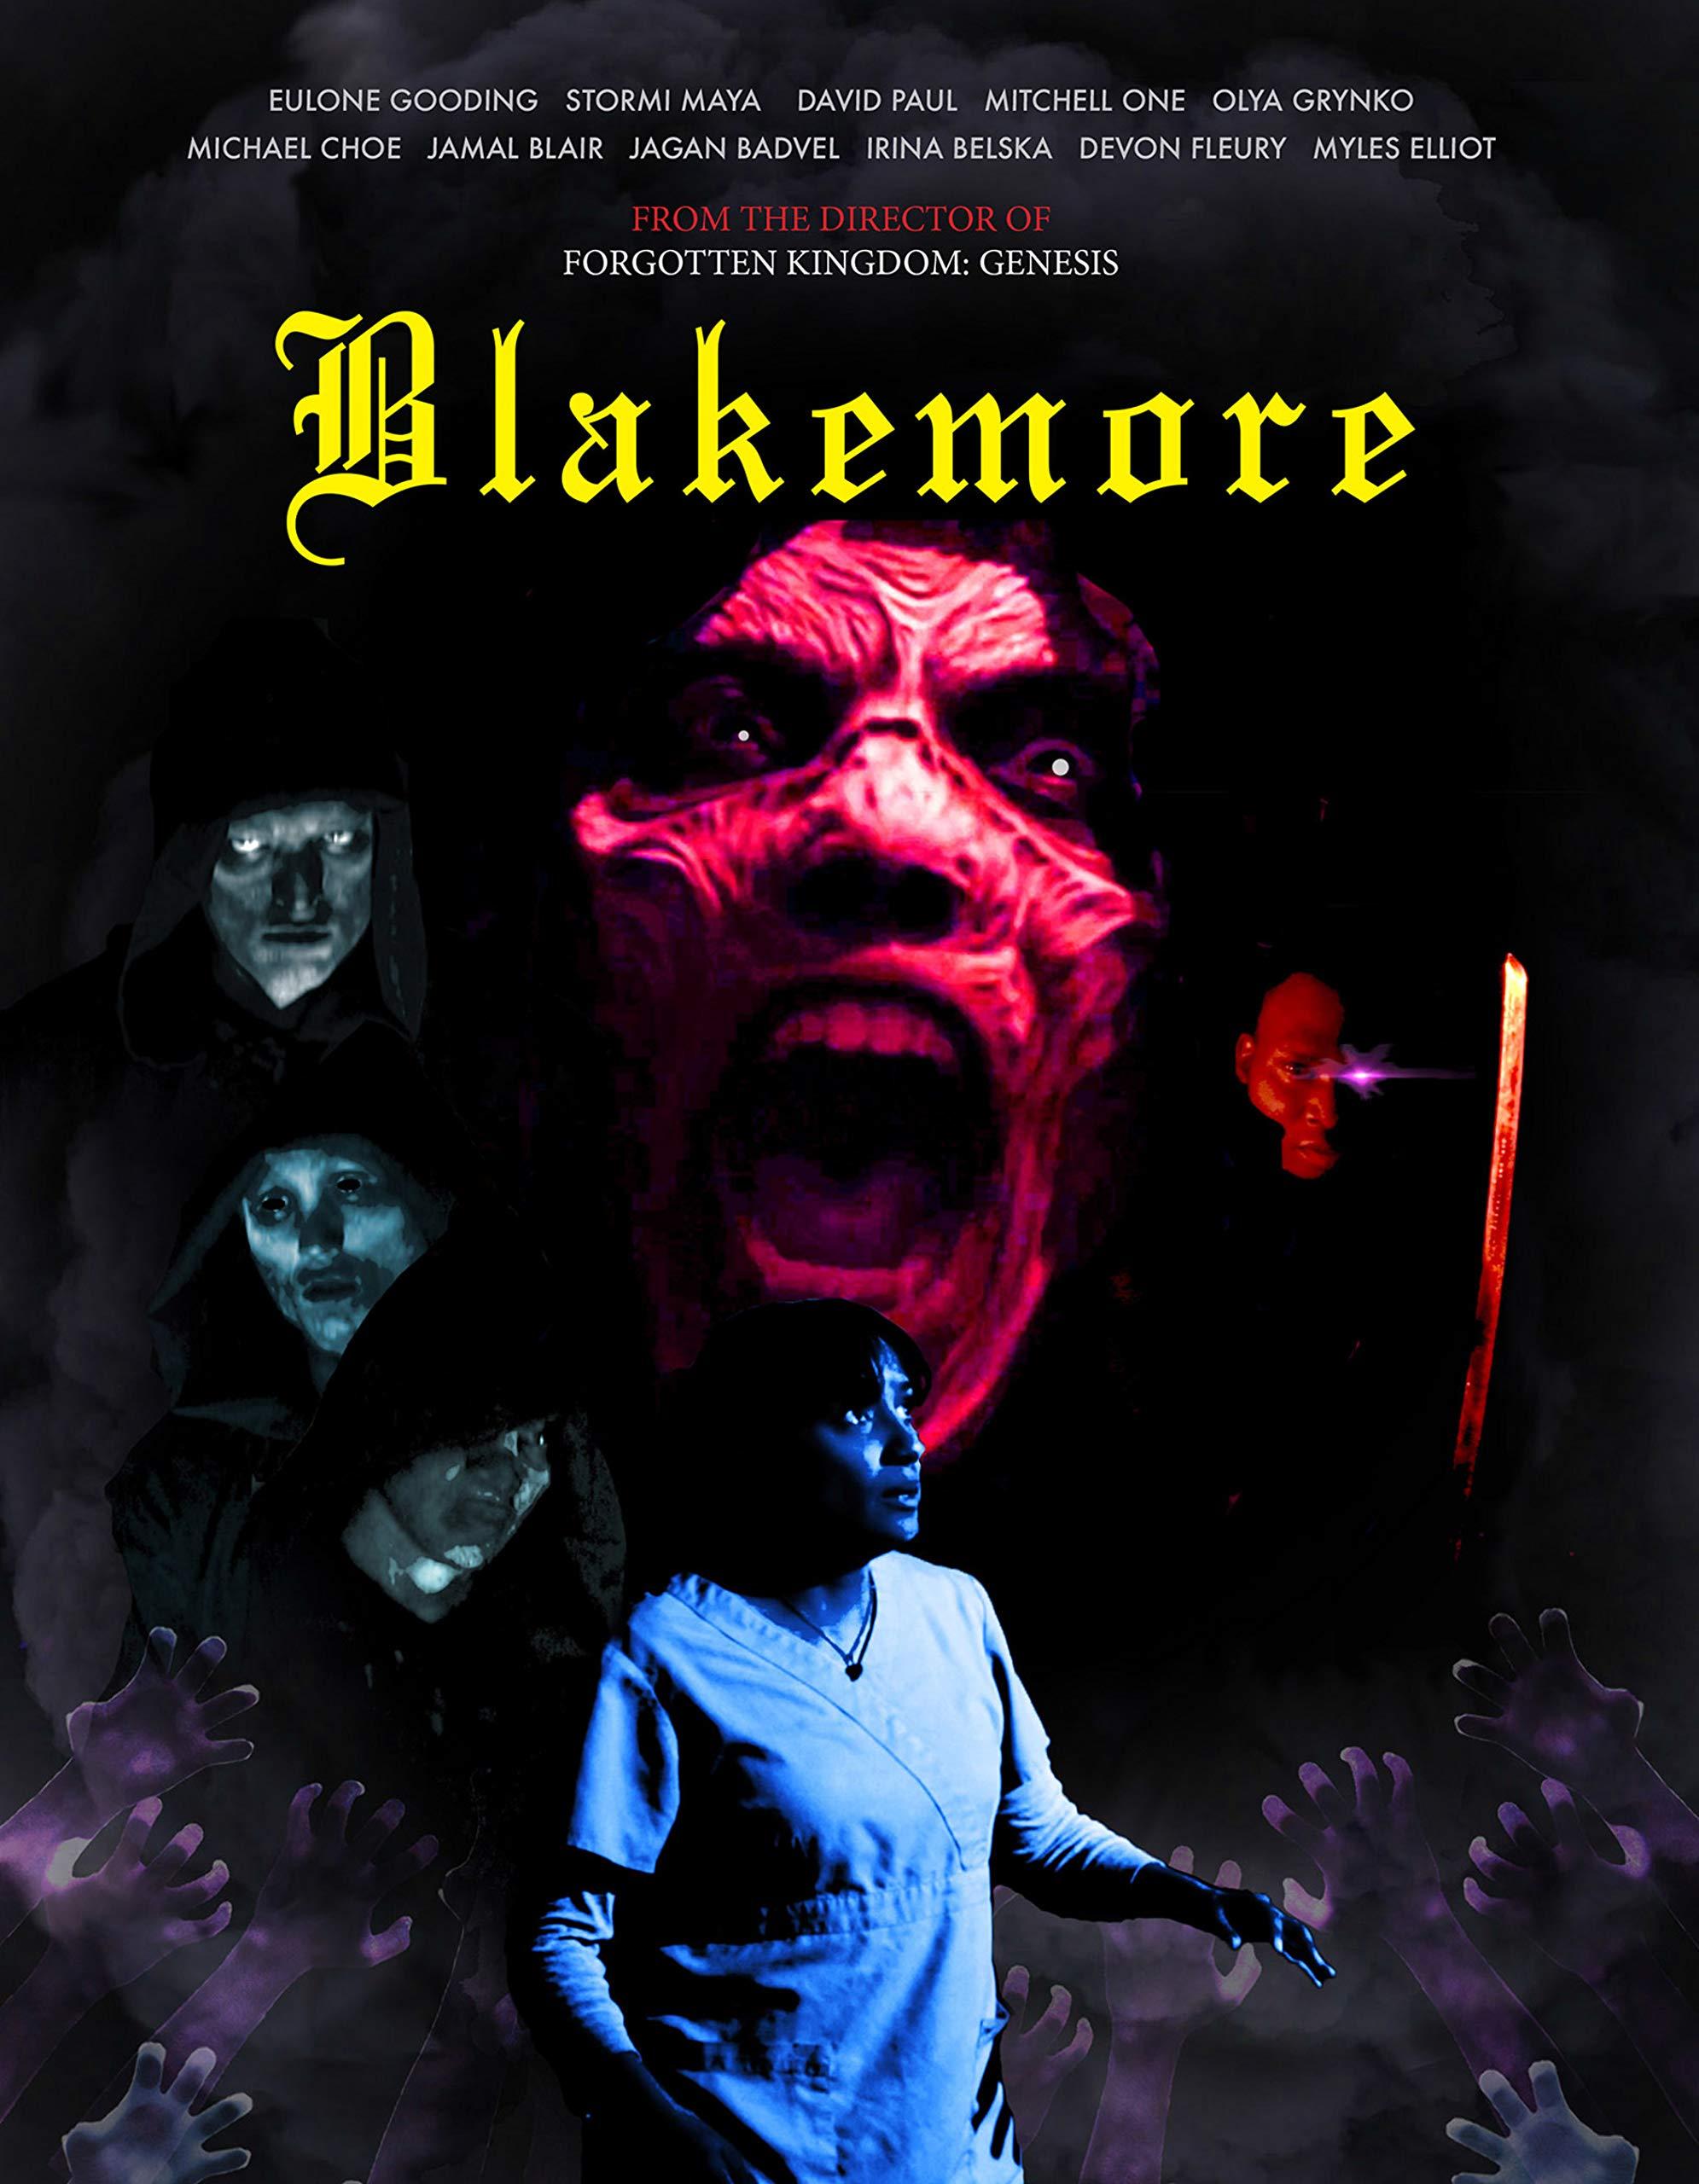 Blakemore on Amazon Prime Video UK